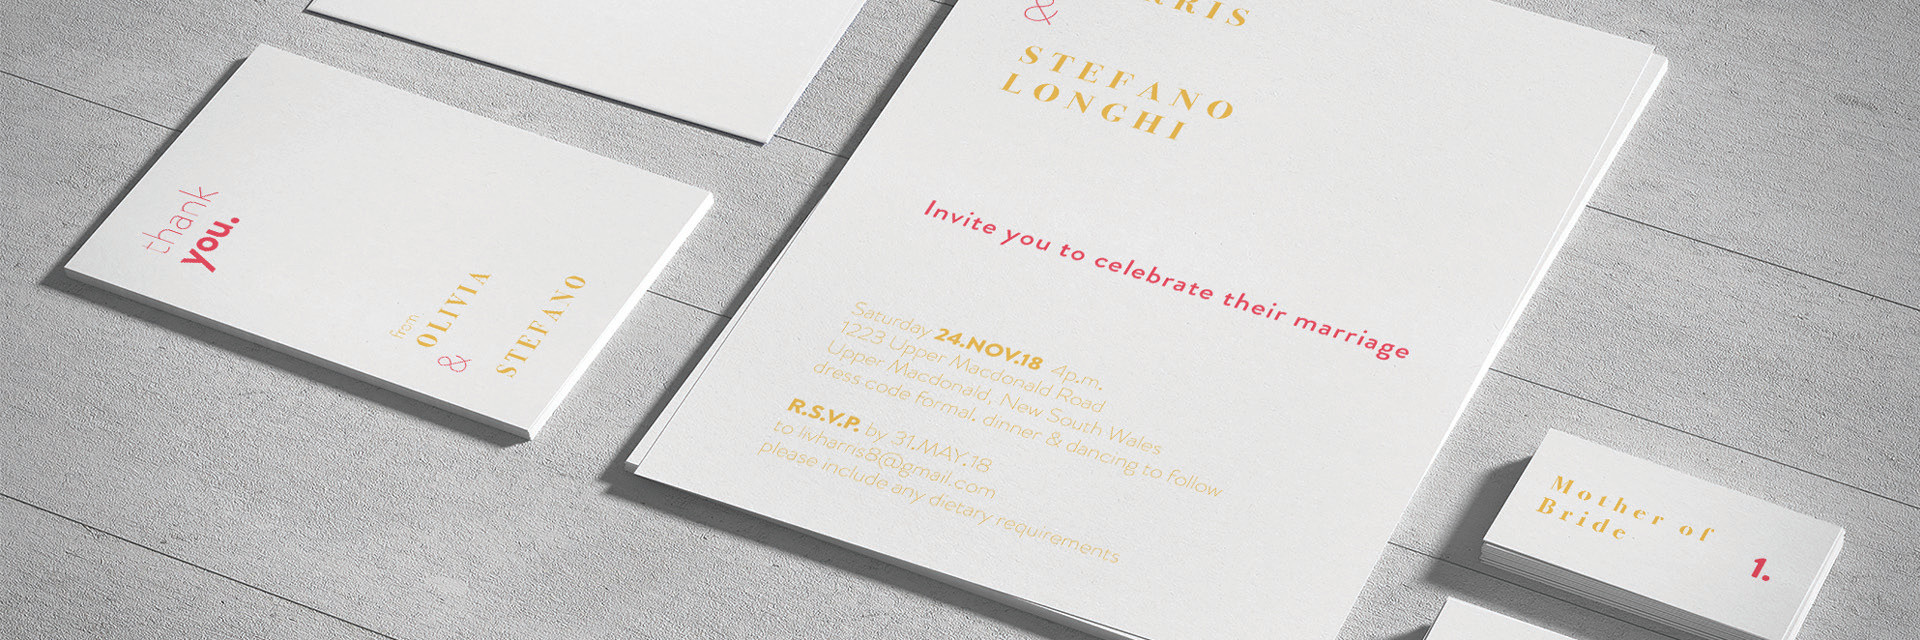 The Longhi's Wedding Invitations